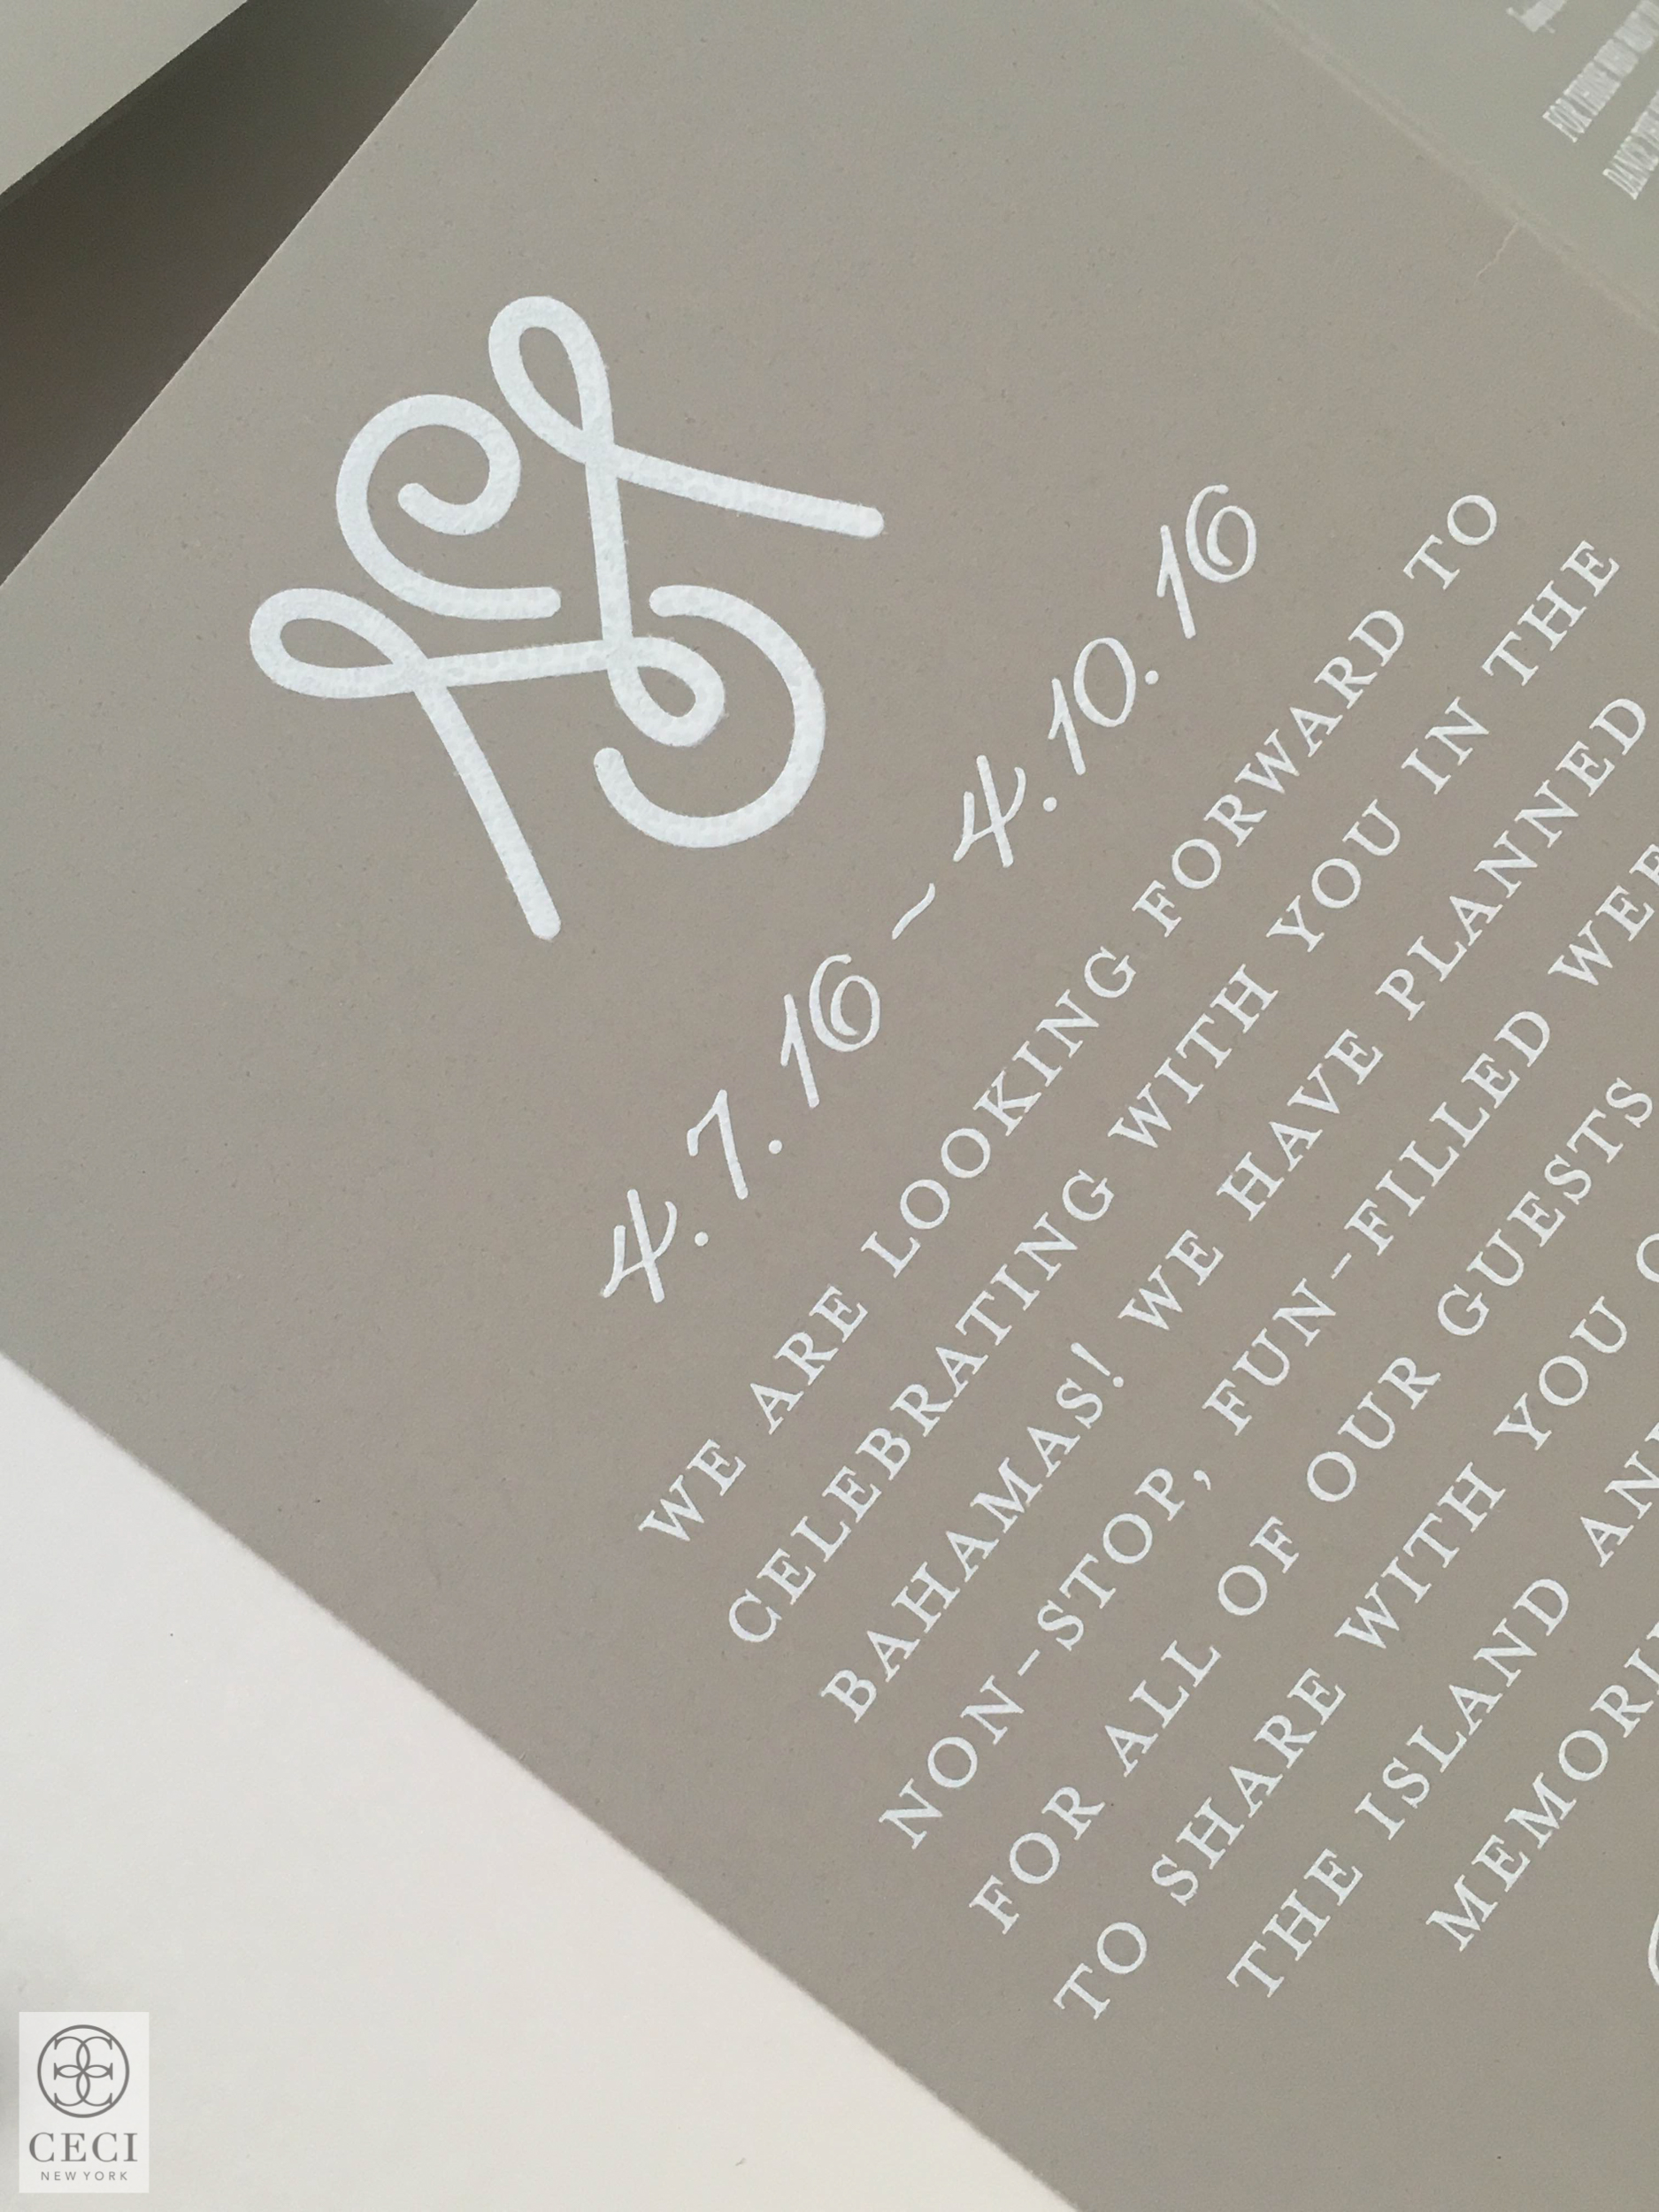 Ceci_New_York_Ceci_Style_Ceci_Johnson_Luxury_Lifestyle_Paradise_Island_Bahamas_Wedding_Engraved_Inspiration_Design_Custom_Couture_Personalized_Invitations_--11.jpg